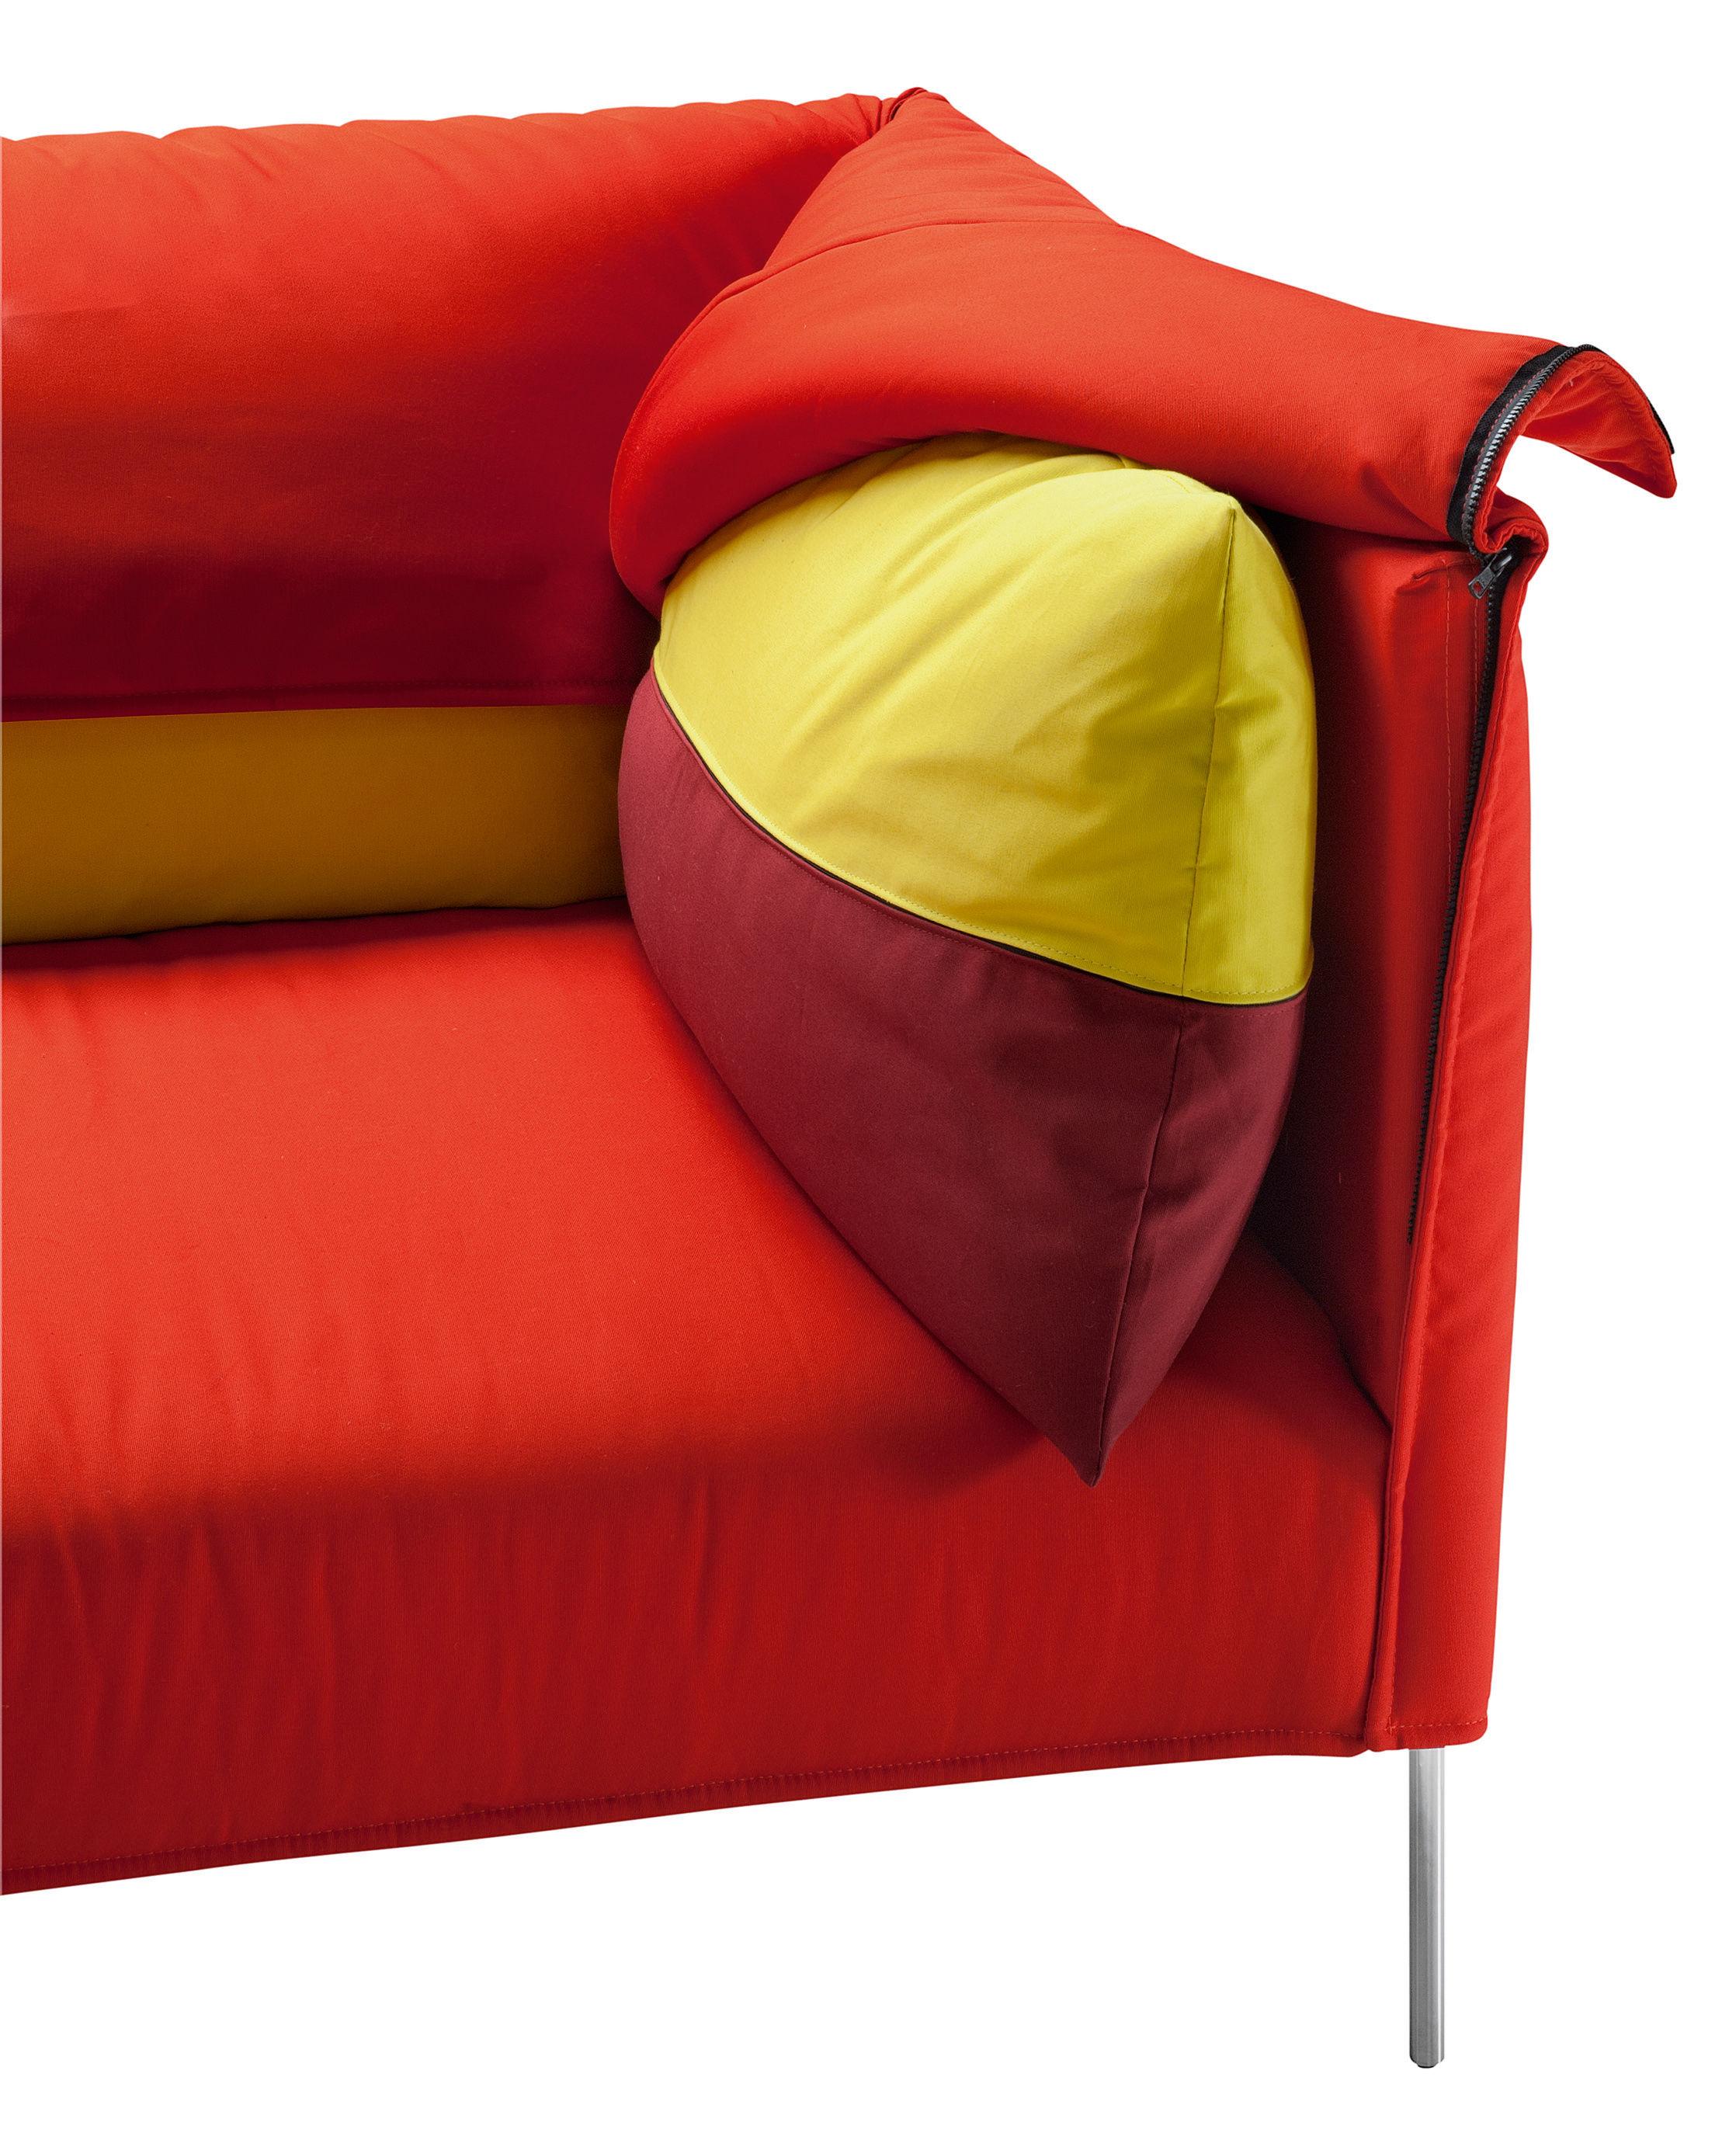 undercover 3 sitzer l 257 cm zanotta sofa. Black Bedroom Furniture Sets. Home Design Ideas